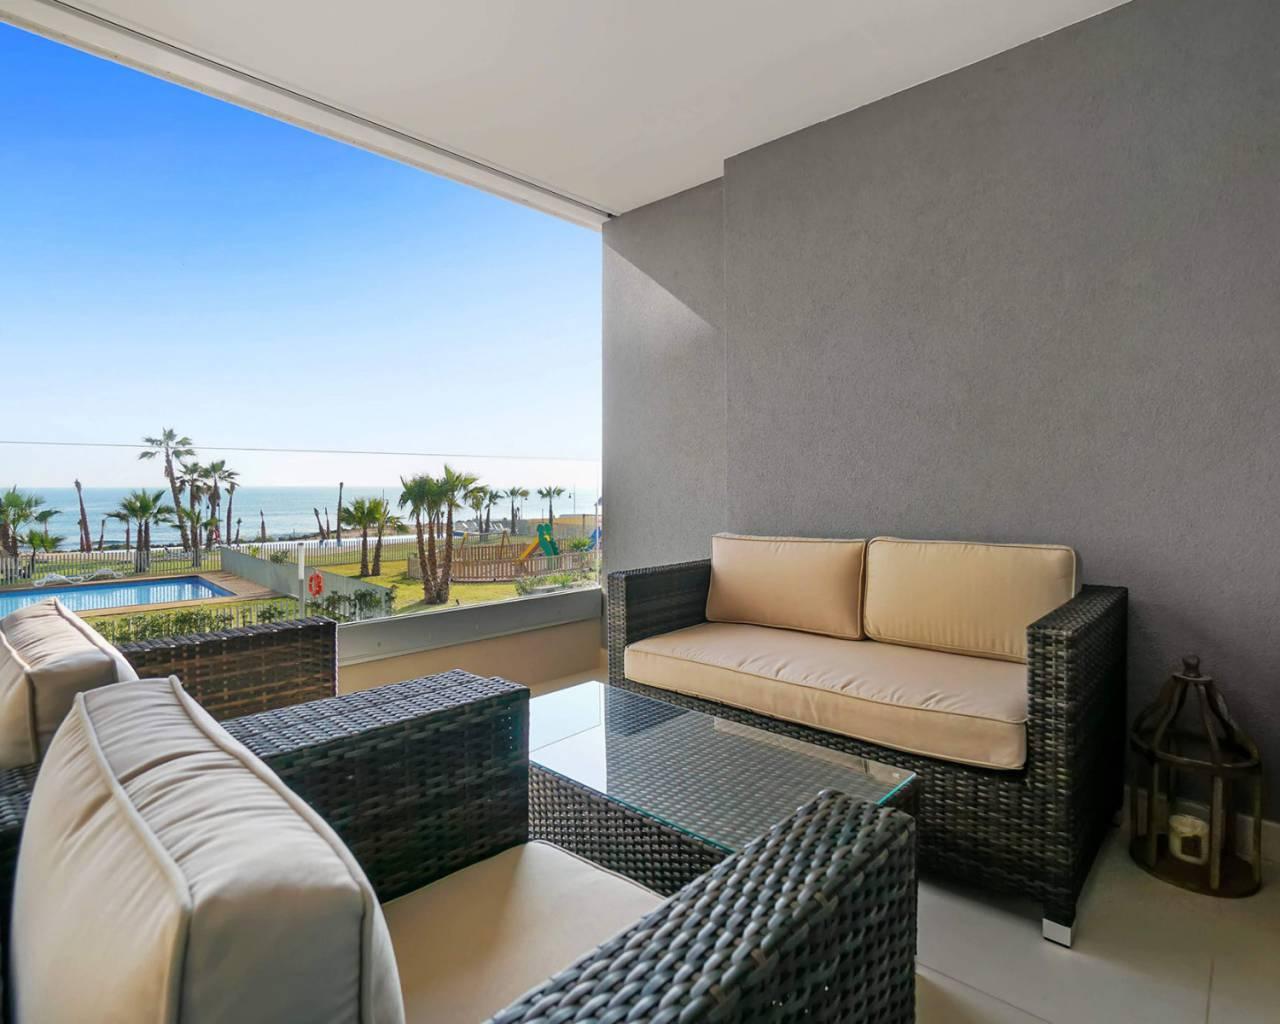 nieuwbouw-appartement-torrevieja-punta-prima_2893_xl